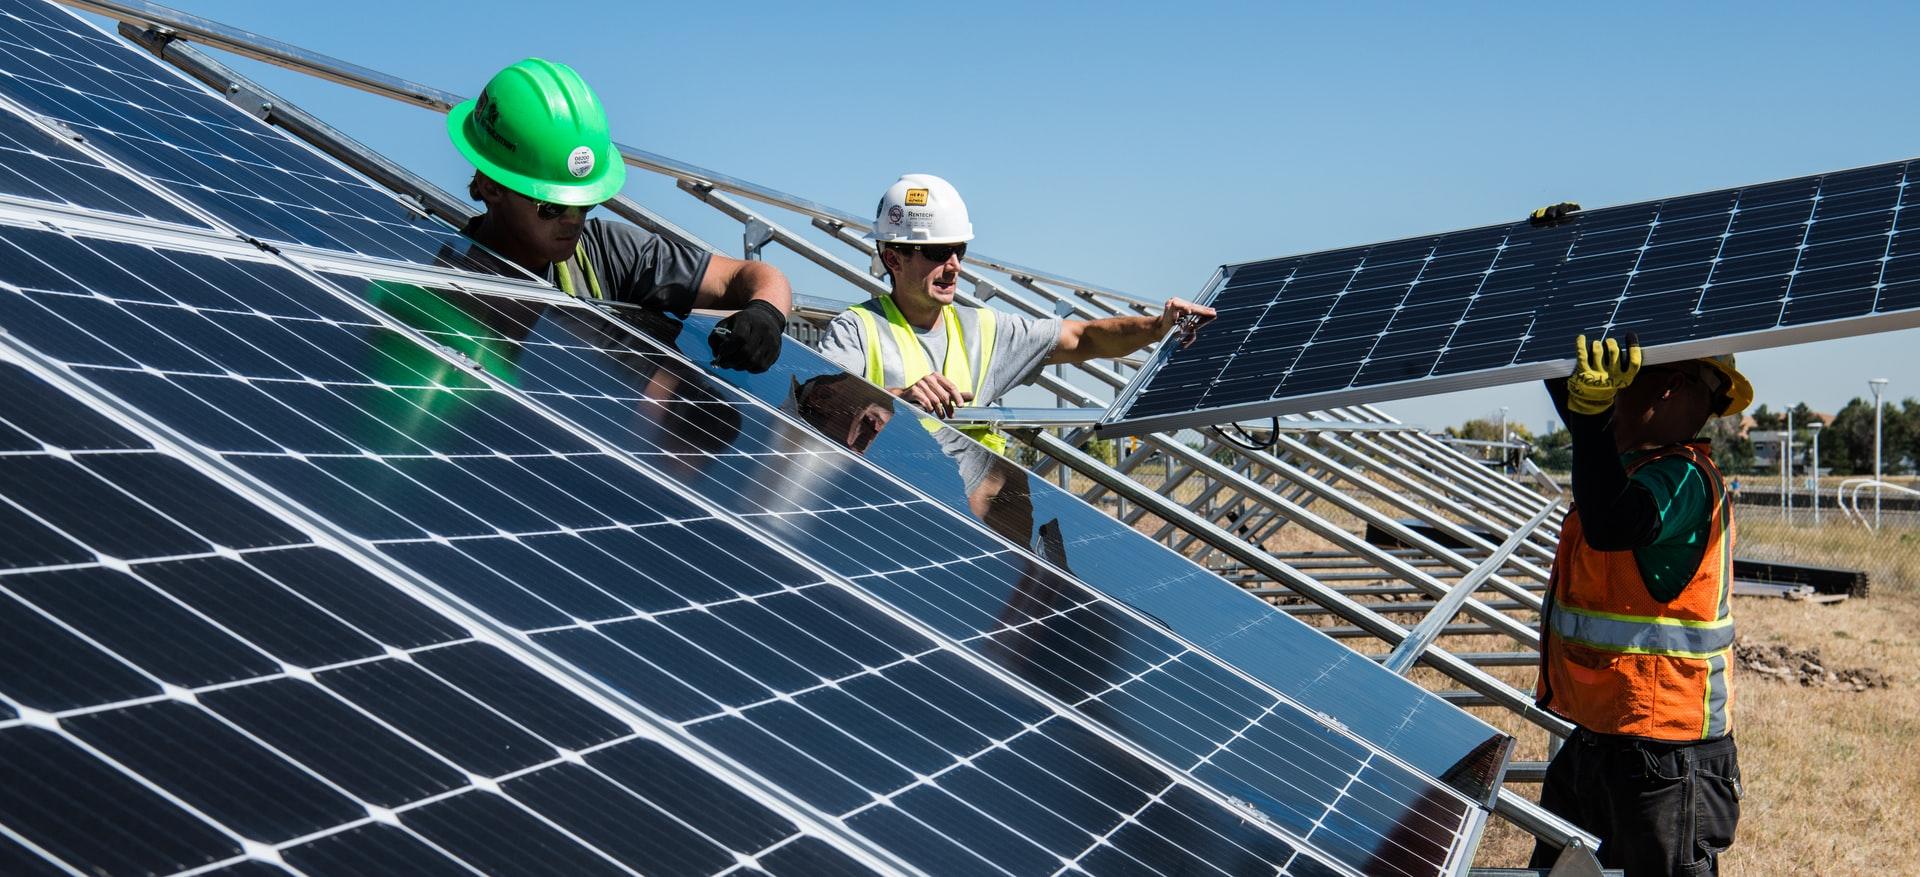 fotovoltaico lavoro jobs